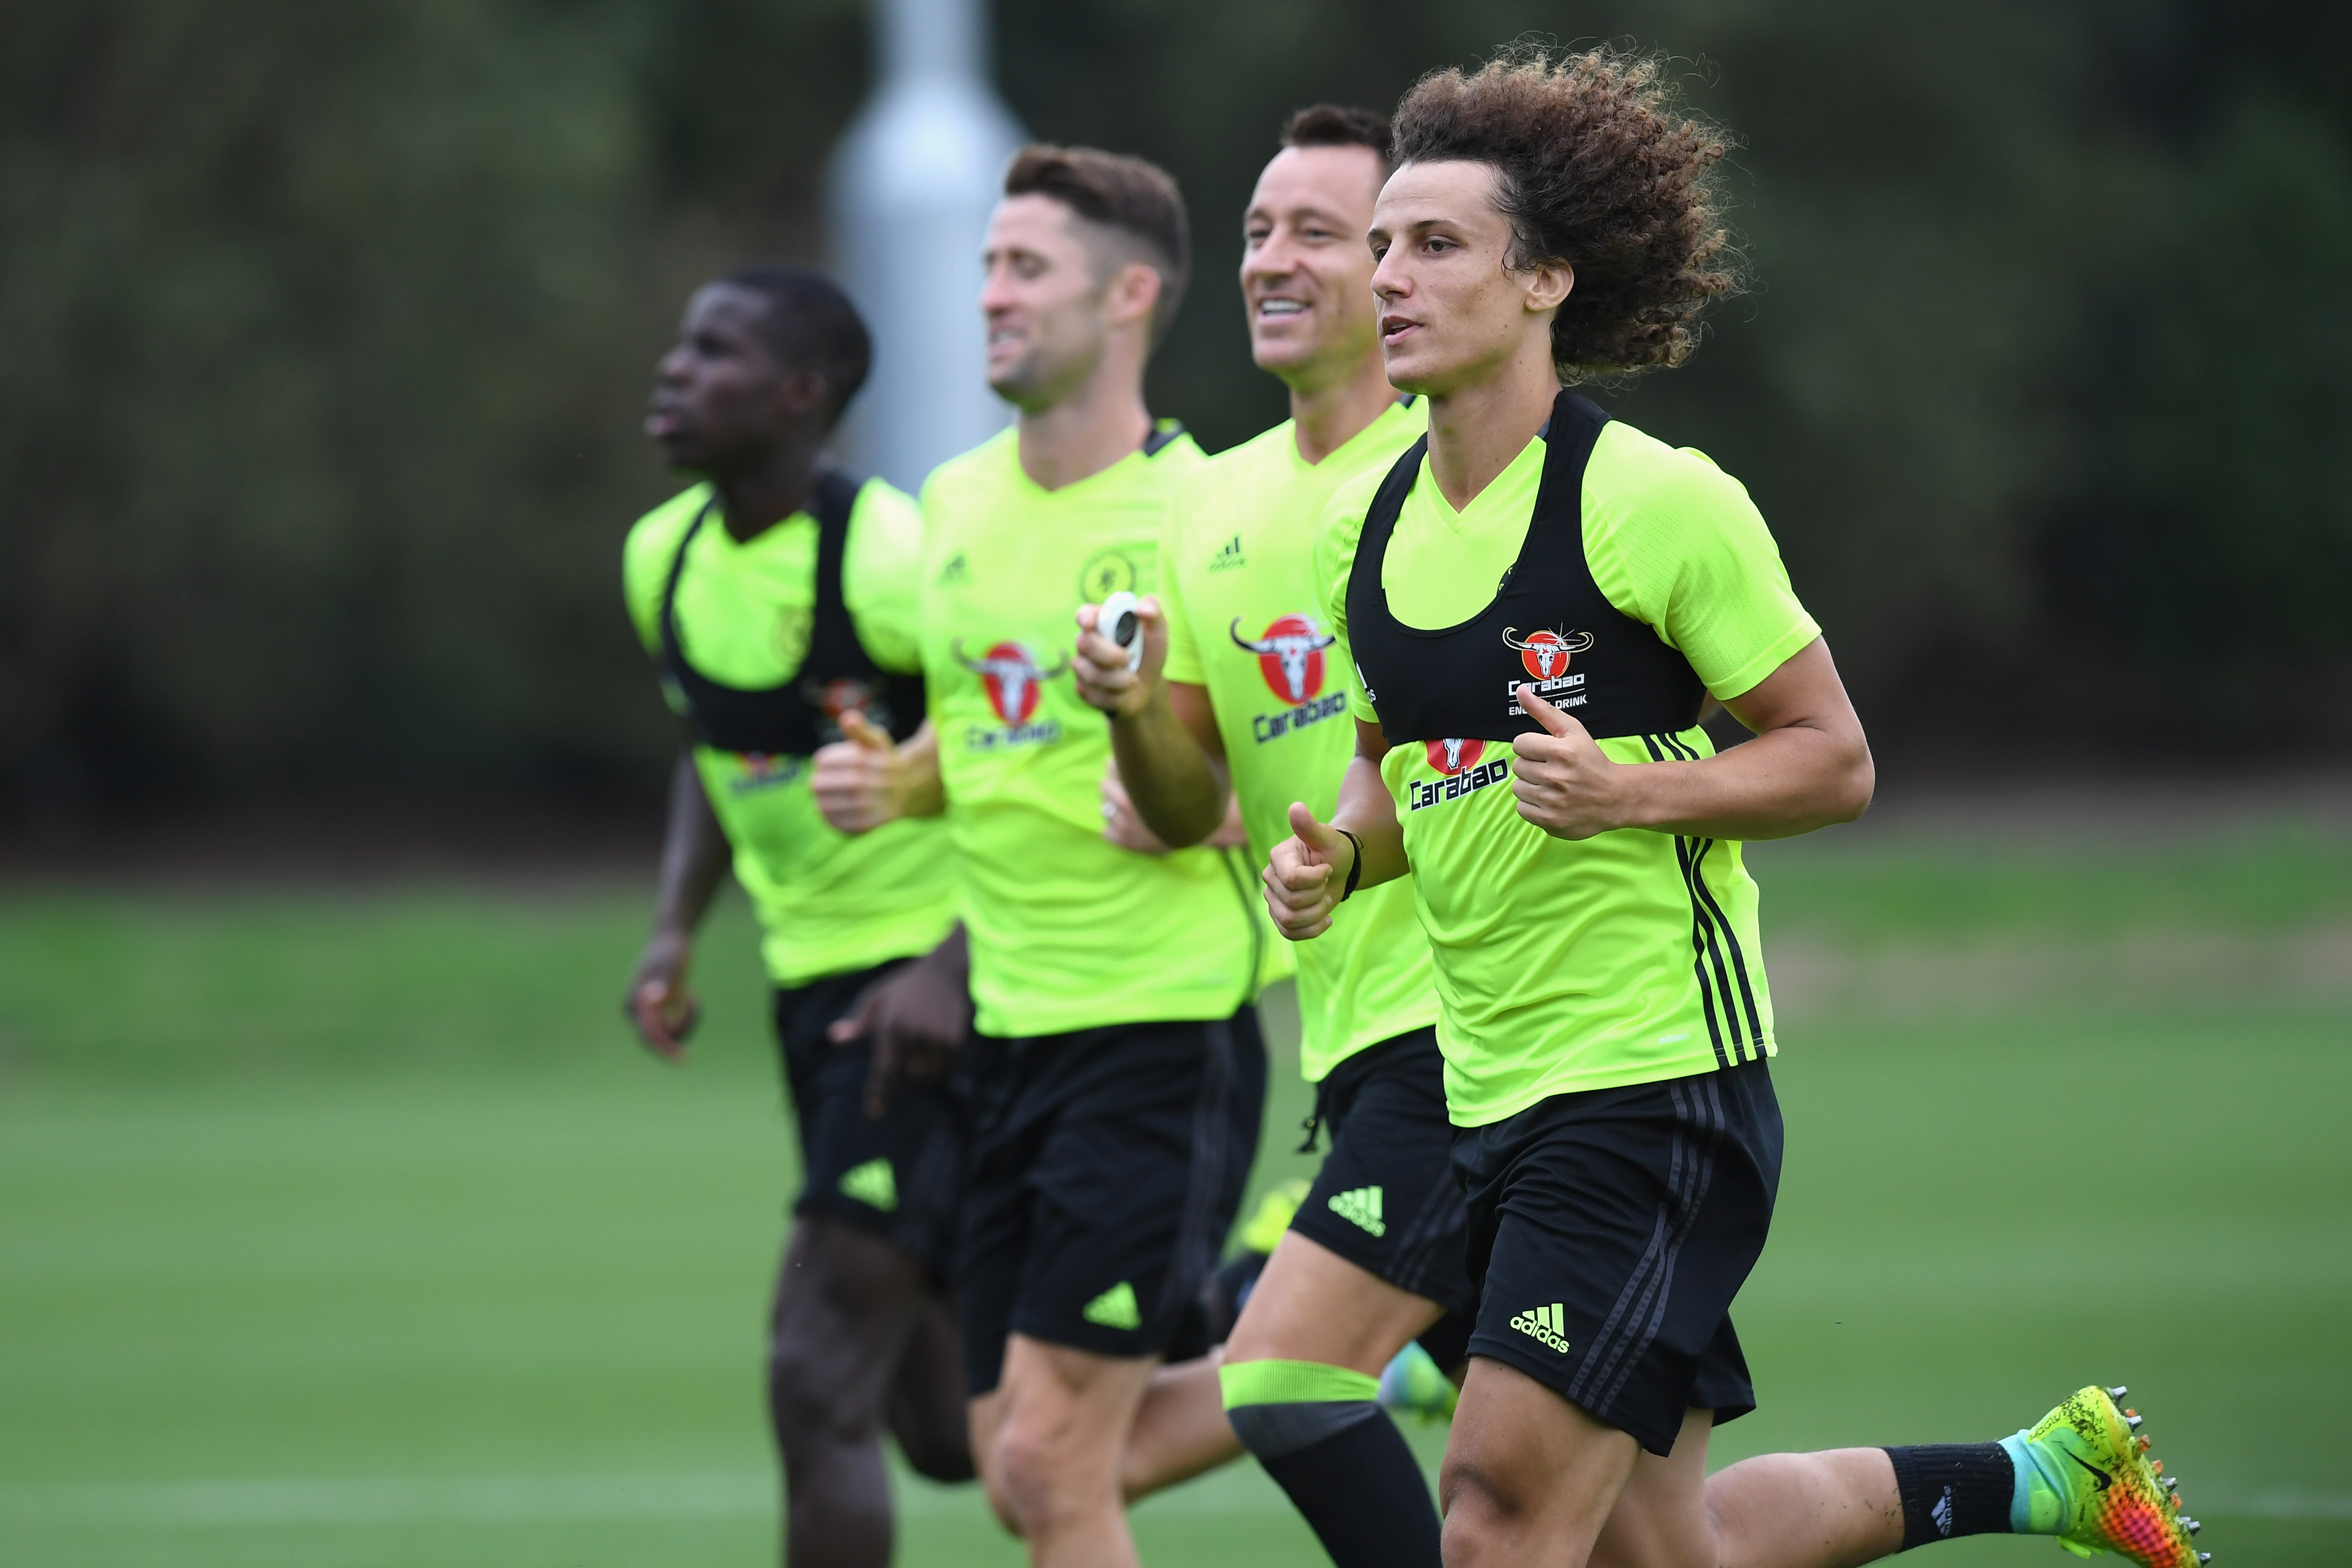 Chelsea boss Antonio Conte signals the start of the David Luiz Experience, Part Deux